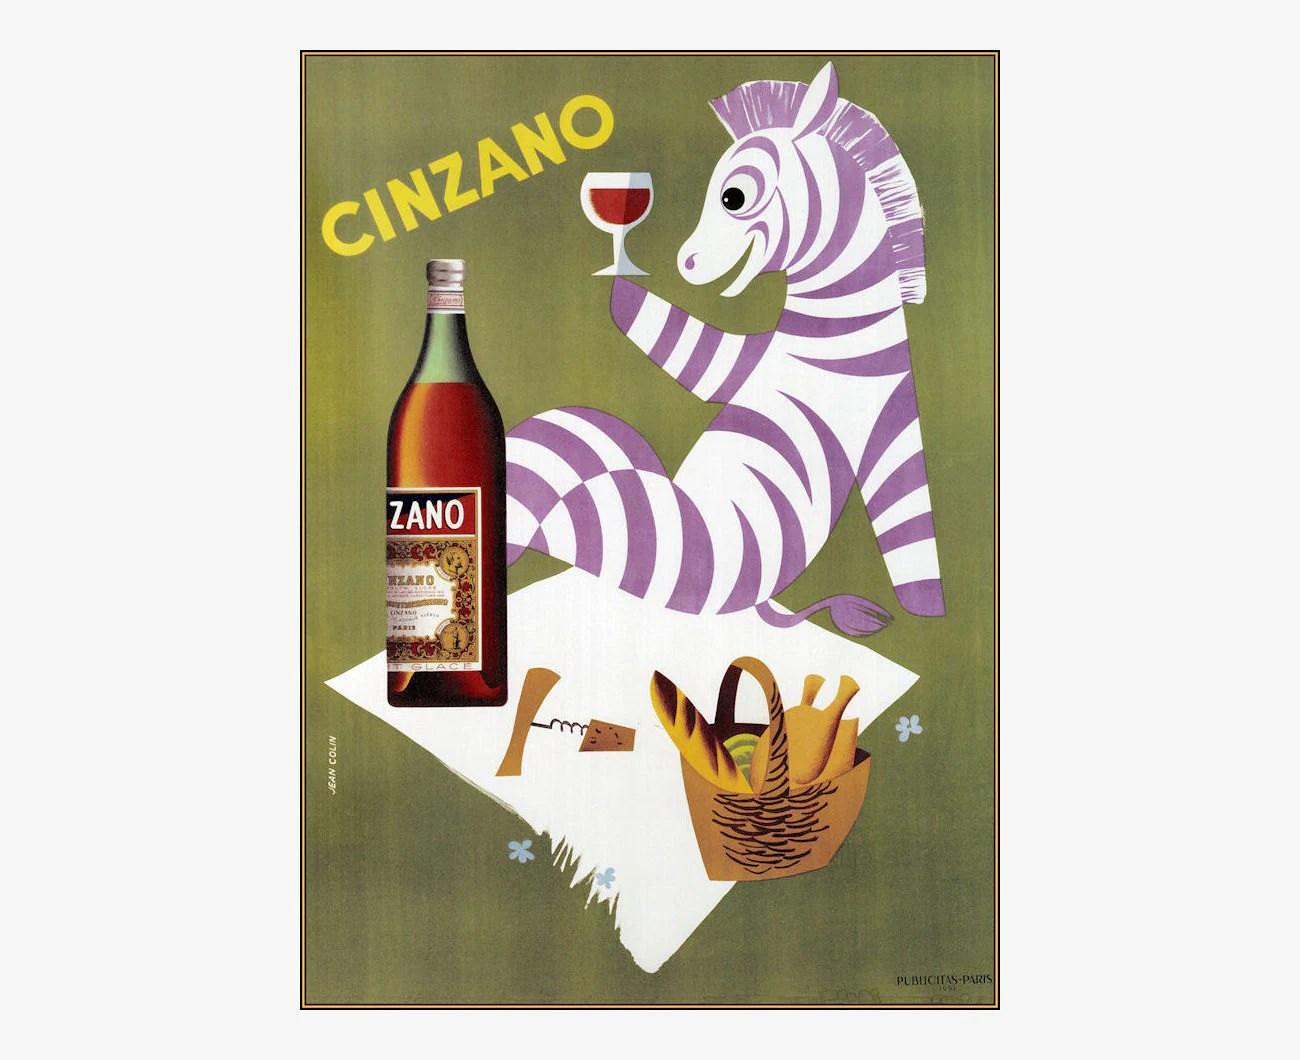 Cinzano Purple Zebra Vintage Poster Vintage Art Print